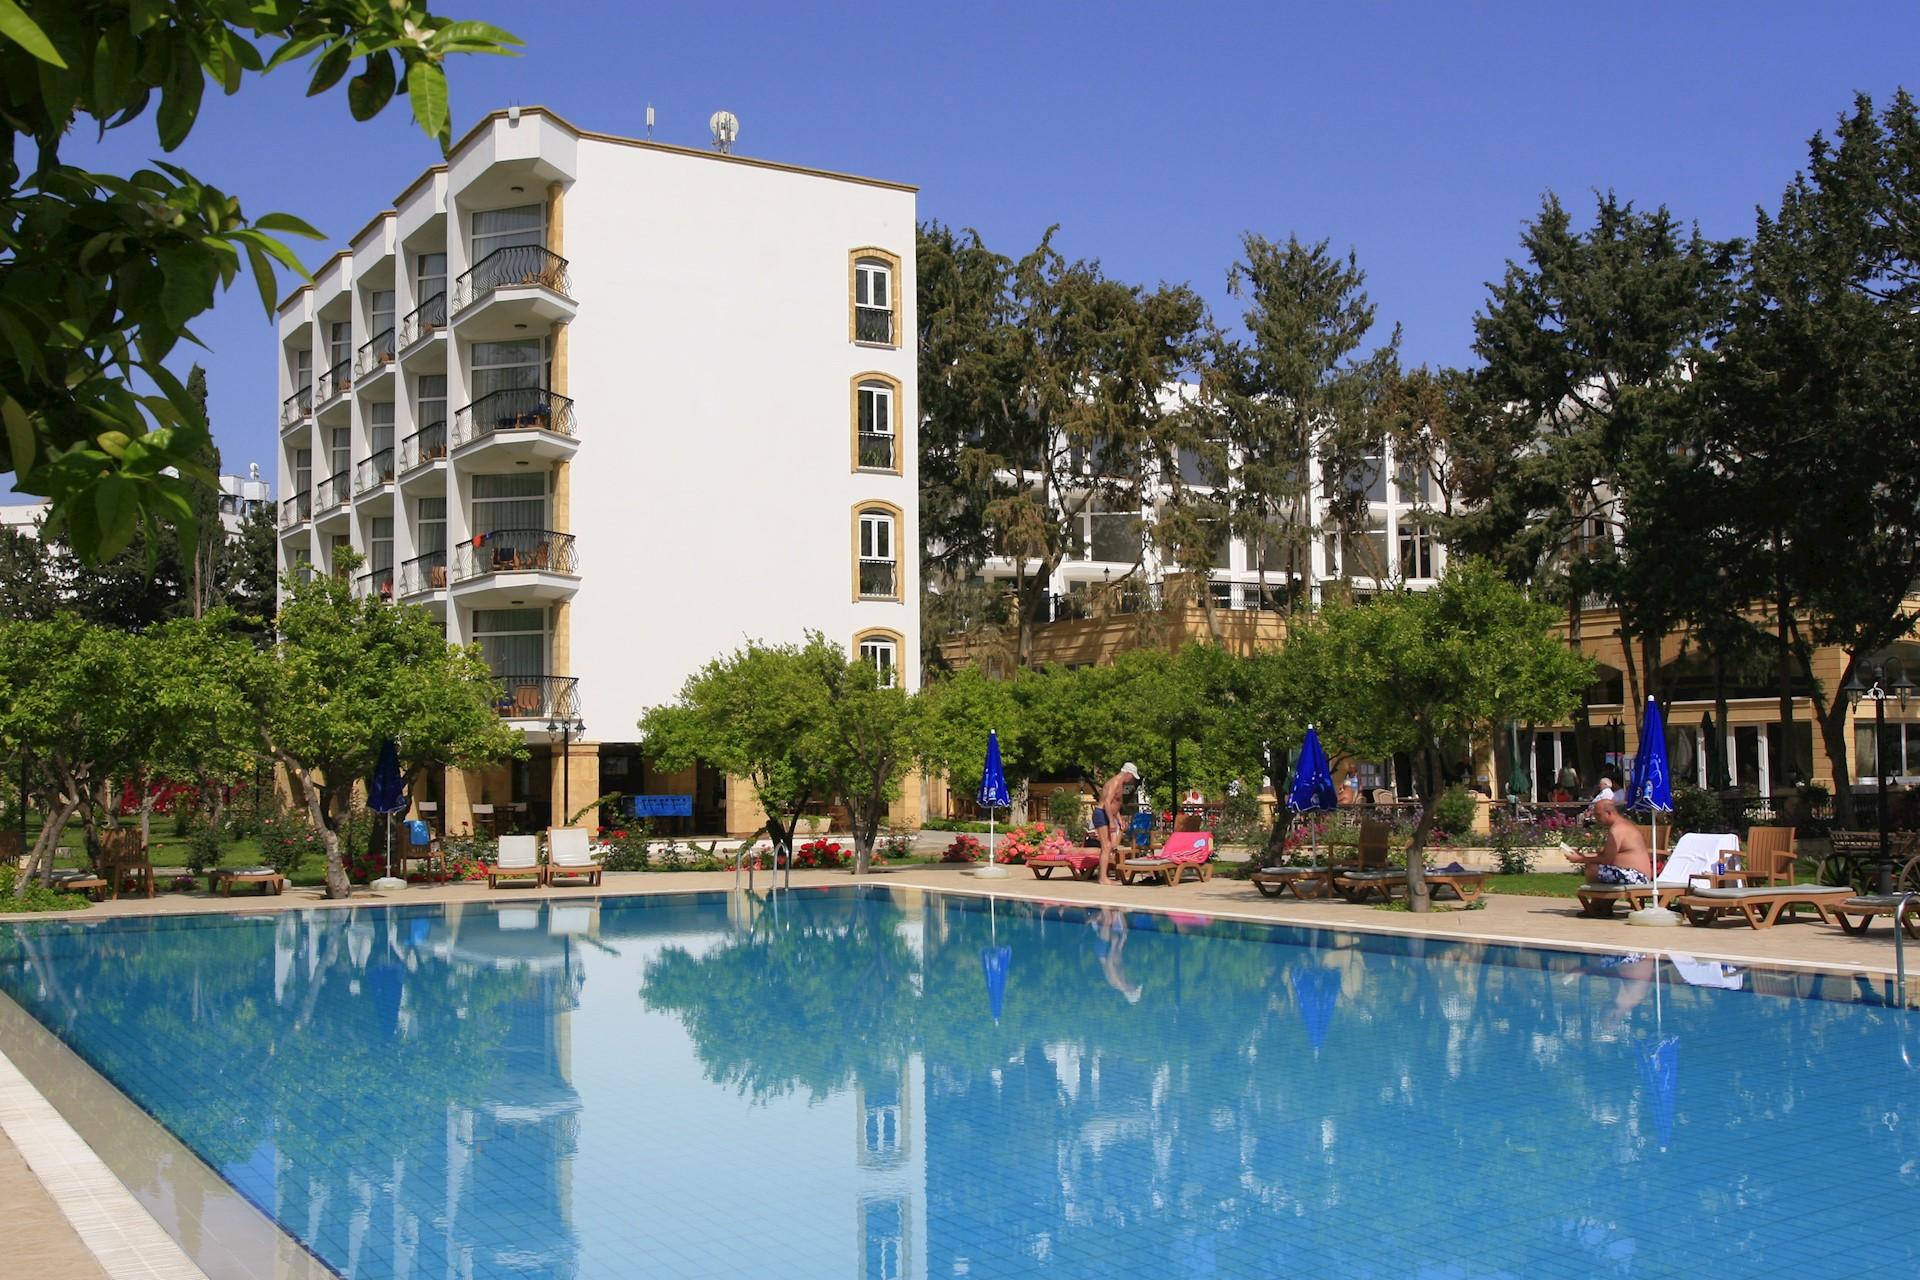 2-pia-bella-hotel-kyrenia .jpg?anchor\u003dcenter\u0026mode\u003dcrop\u0026width\u003d1920\u0026height\u003d950\u0026rnd\u003d131418402570000000\u0026quality\u003d30